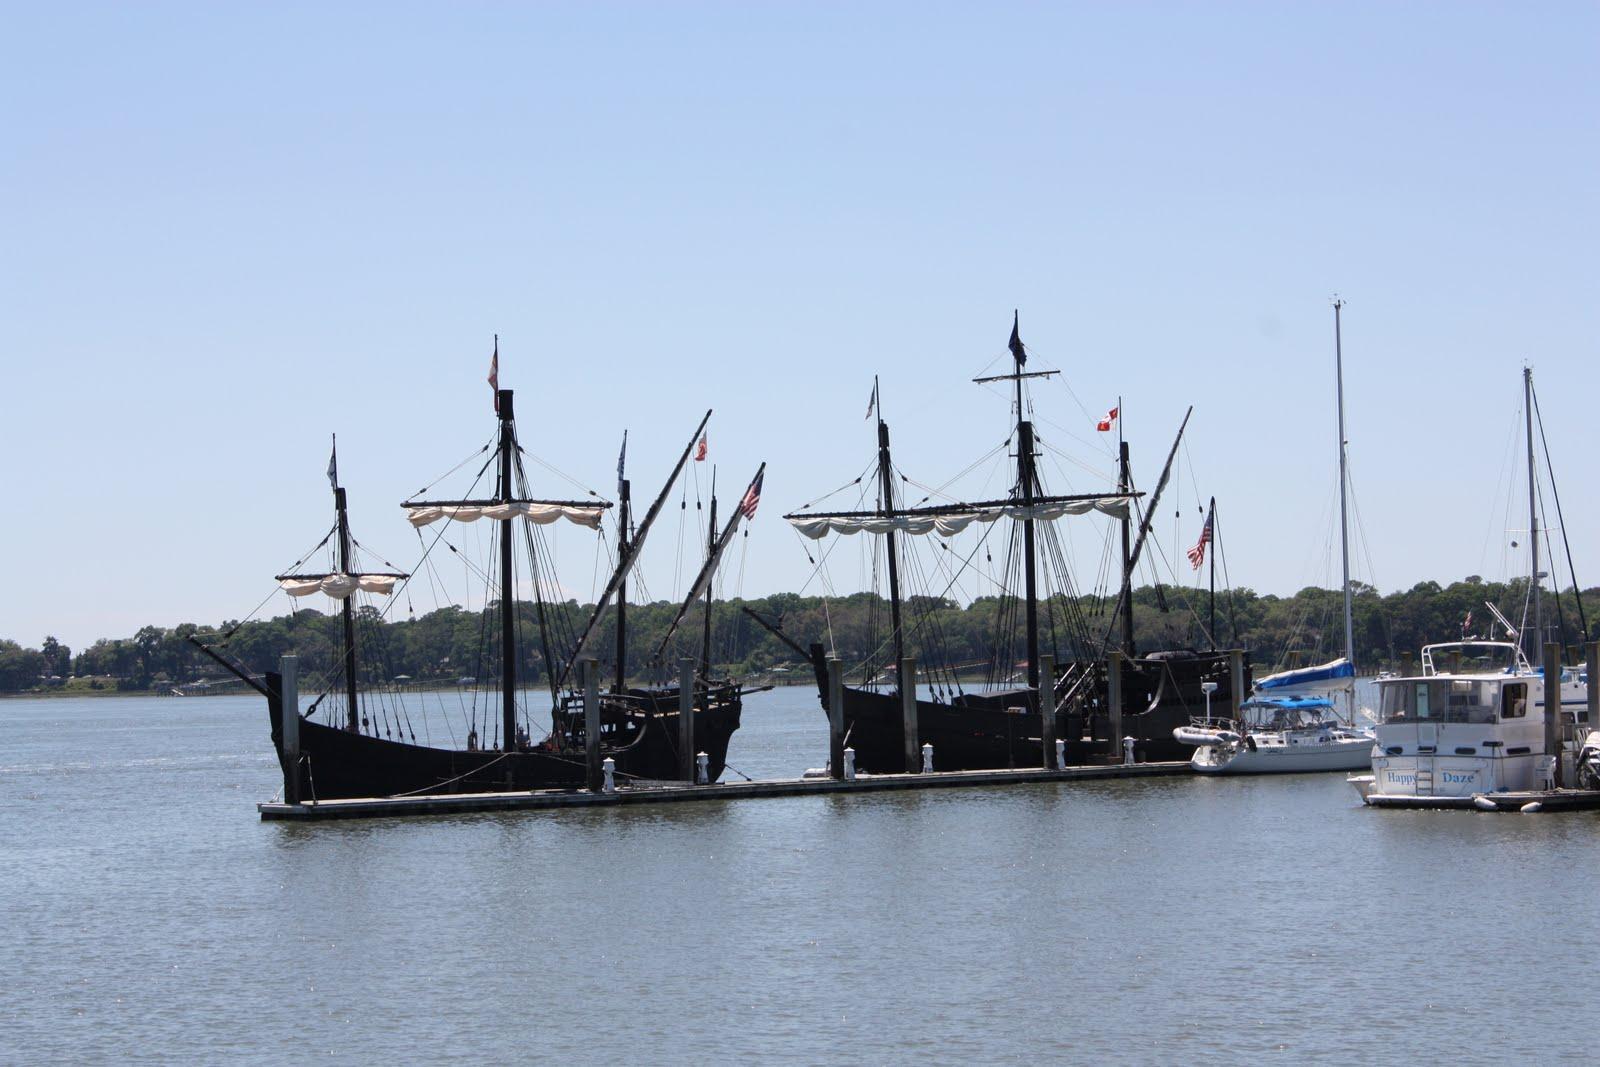 The Jackson House: Christopher Columbus Ships